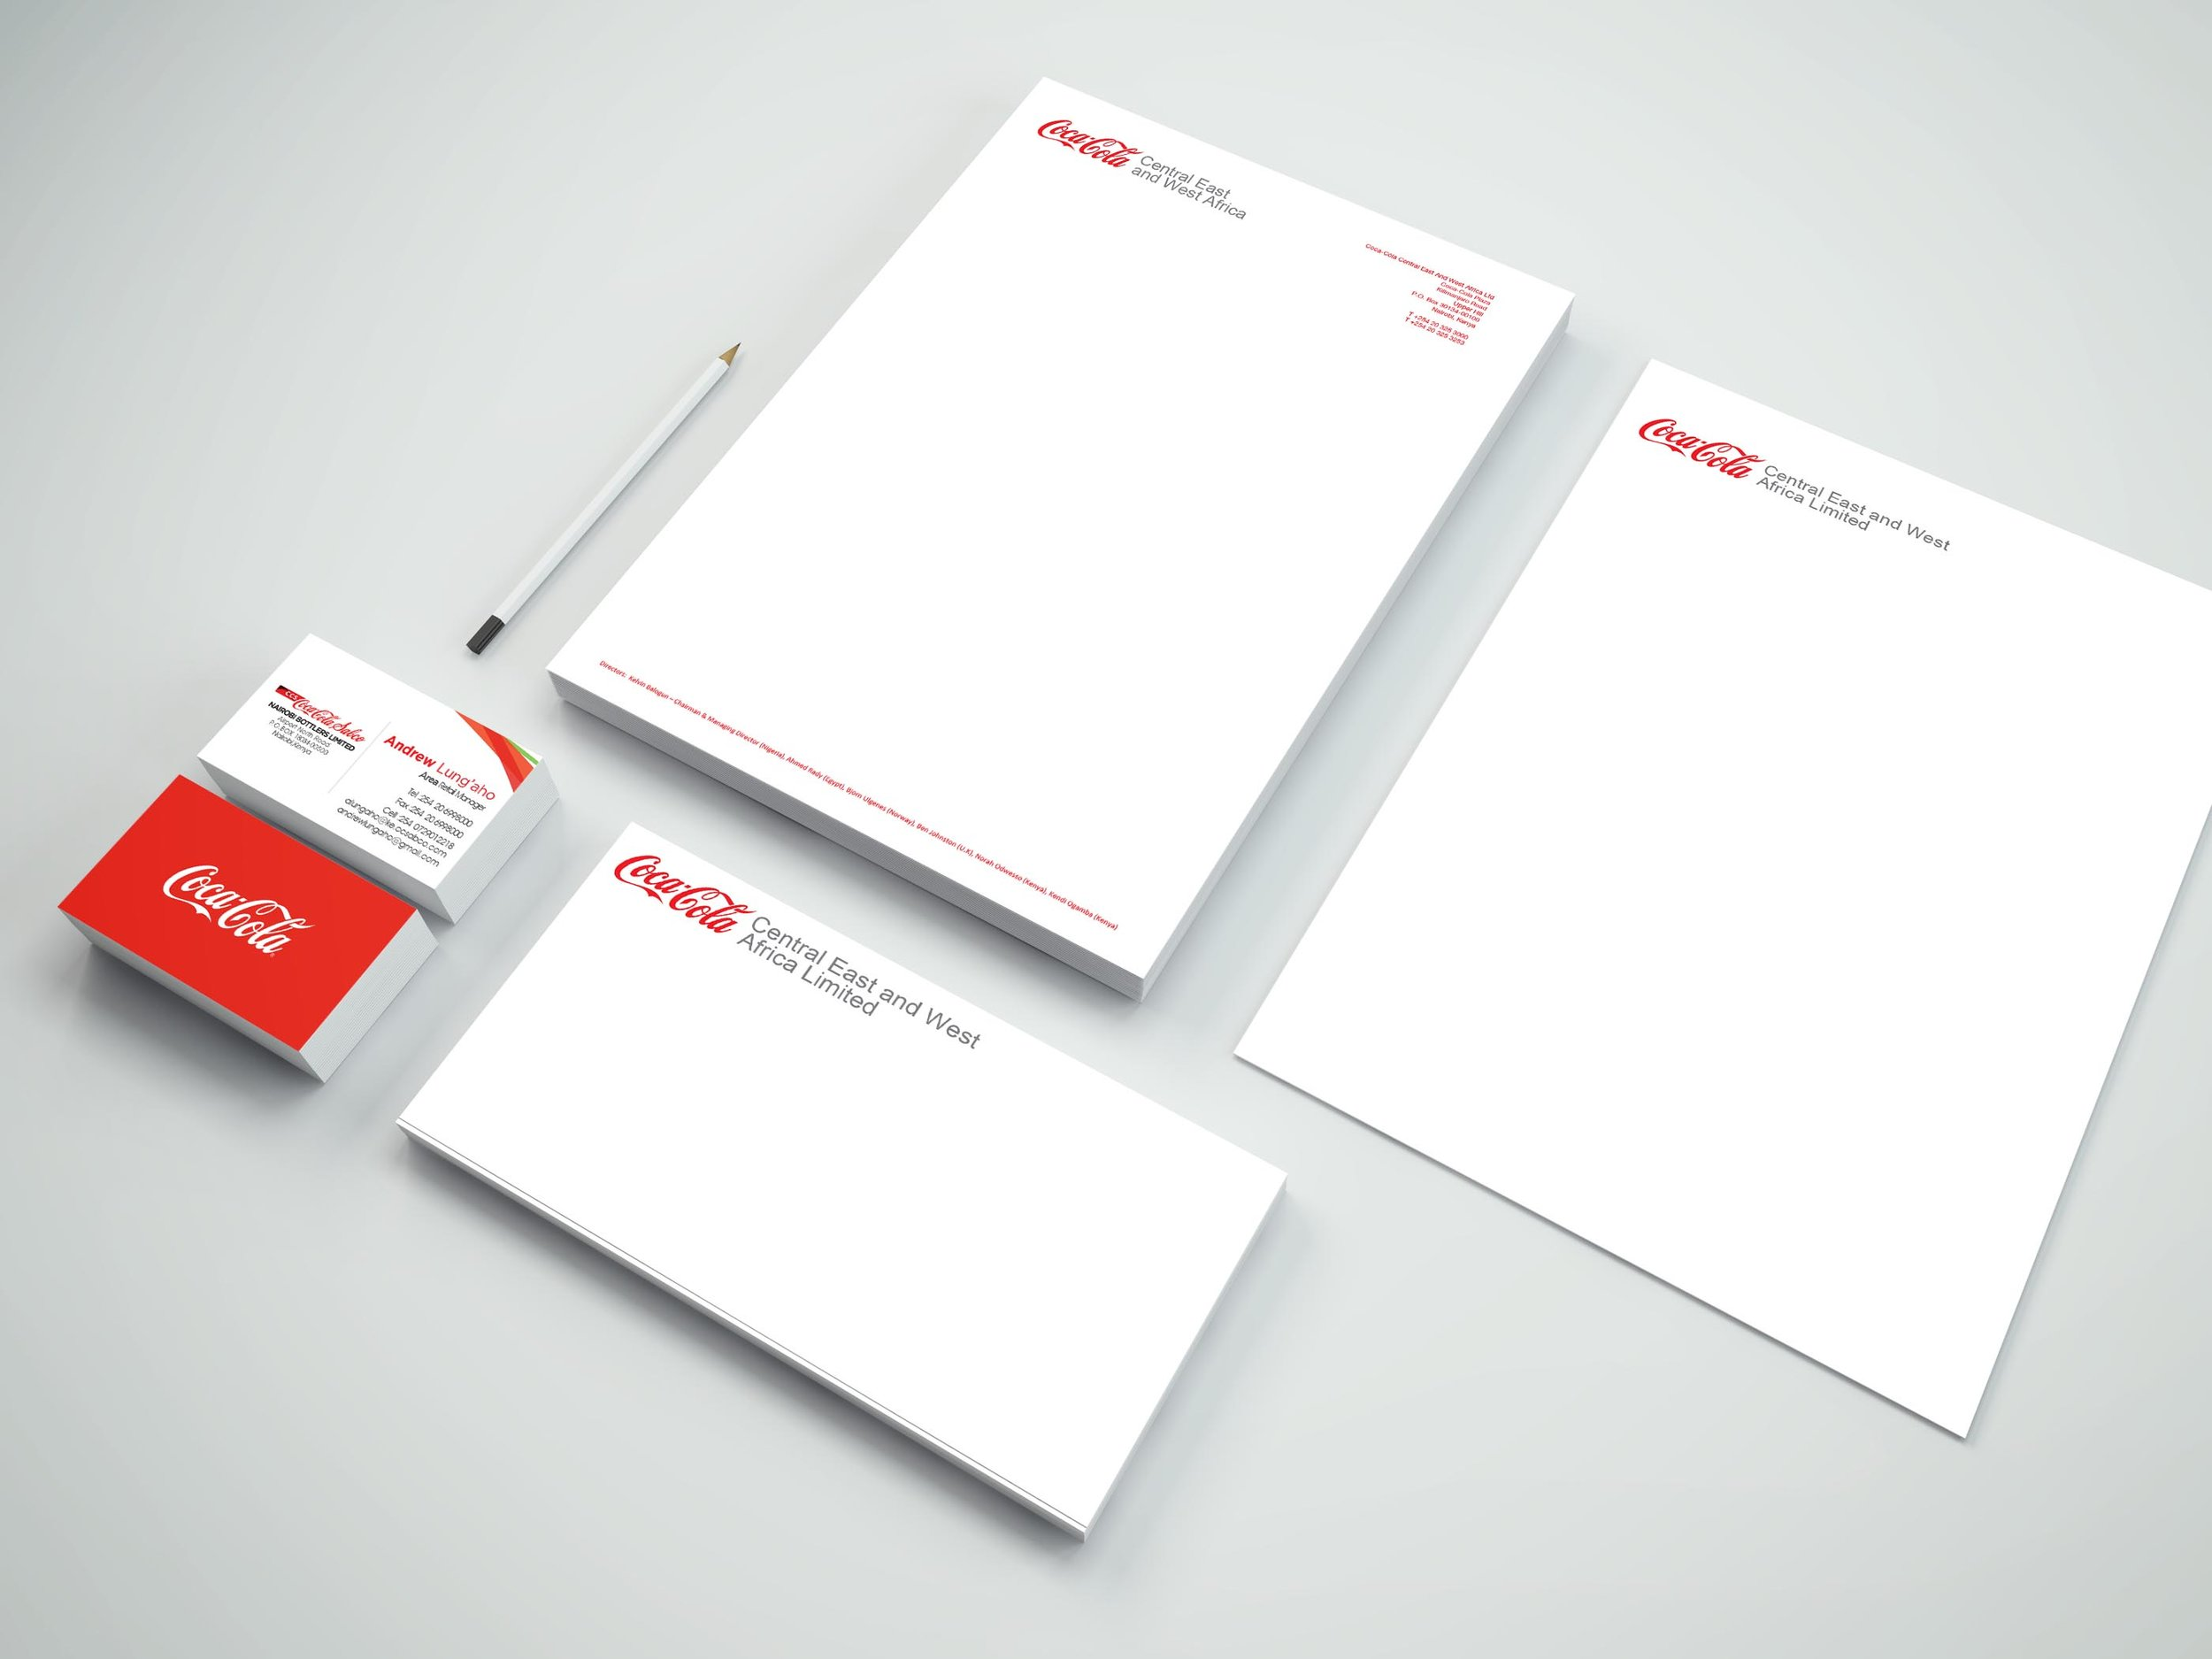 Branding-Stationery Mockup Vol copy - Copy.jpg